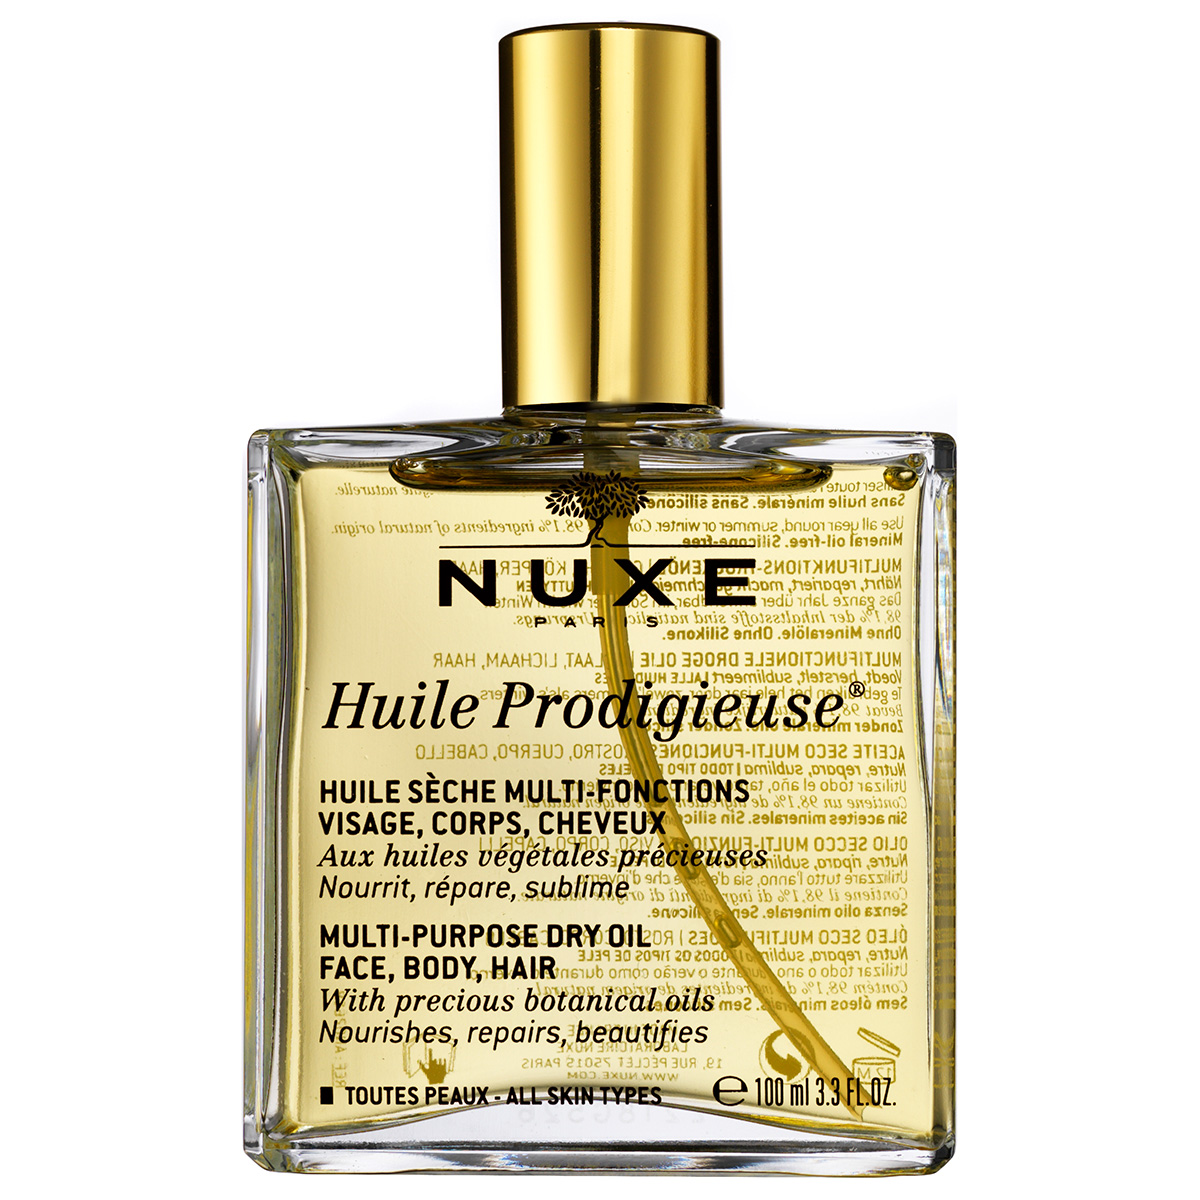 Nuxe Huile Prodigieuse Multi-Purpose Dry Oil - 100 ml